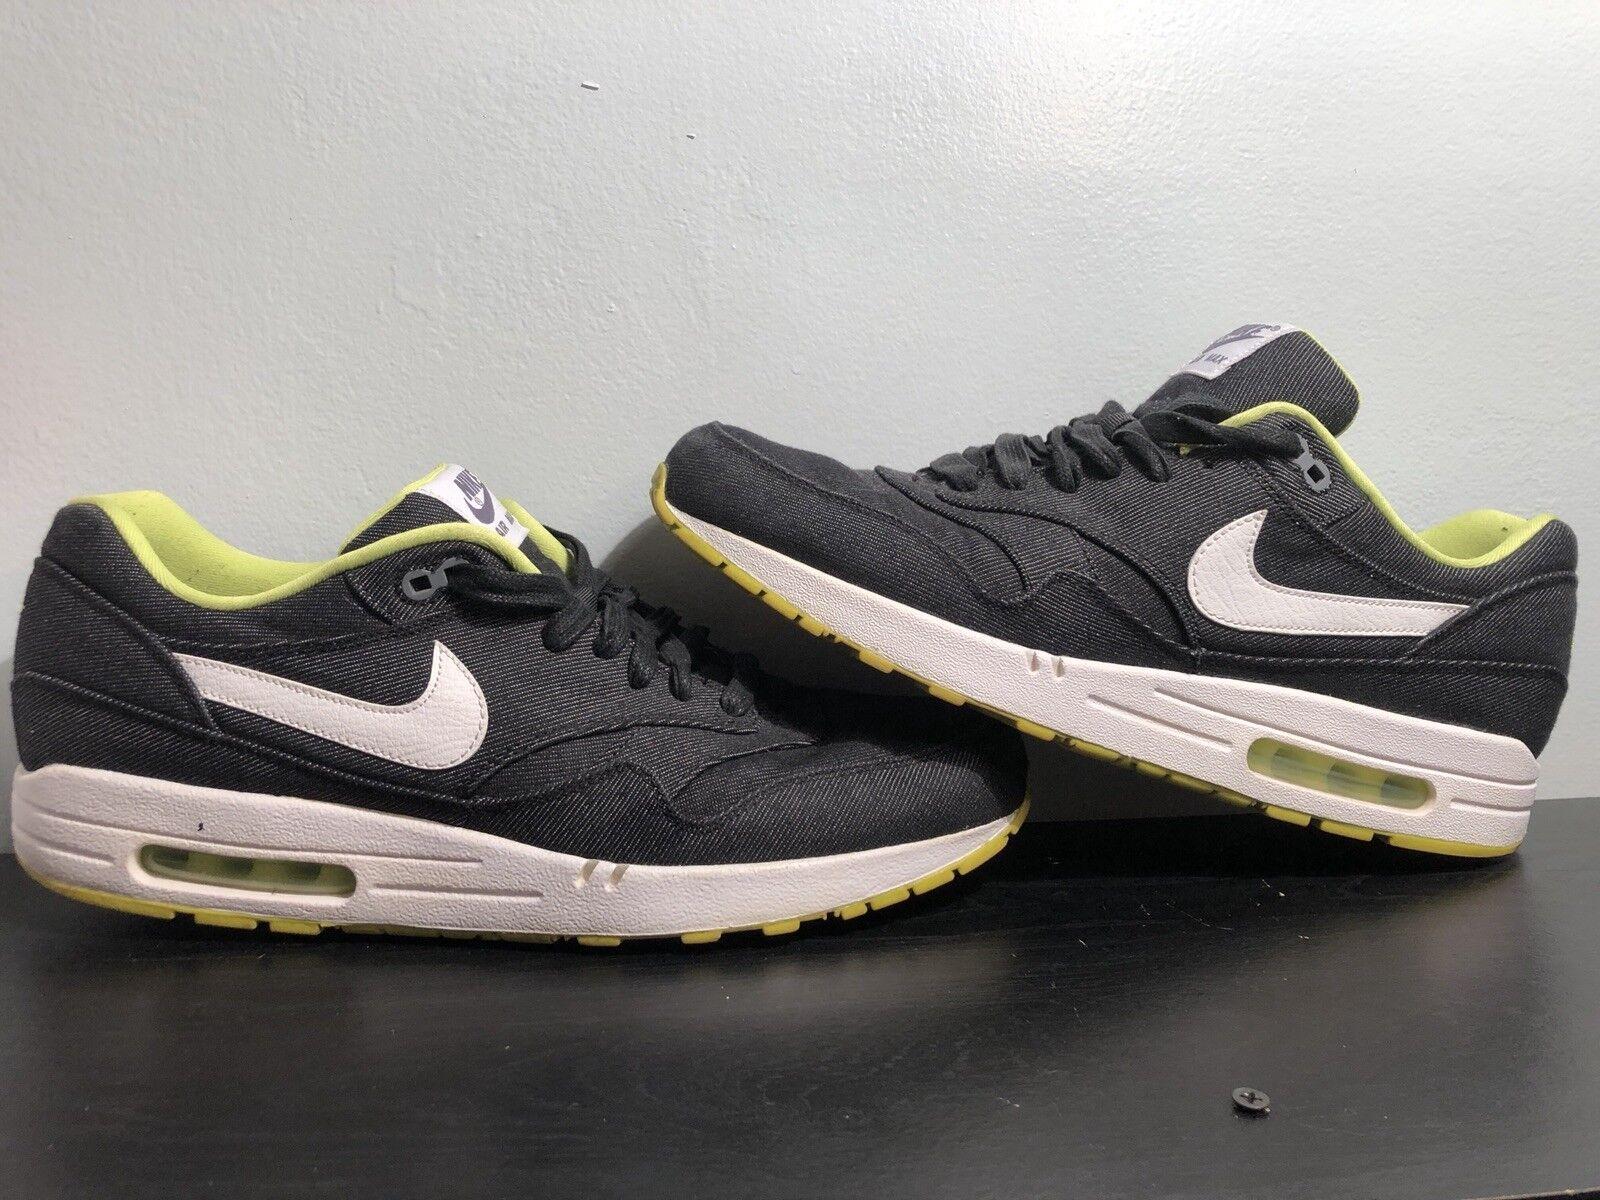 Nike totale bianco 90 laser nero / bianco totale / elettrico iii ibrido green calcio scorpe 7 6a2667